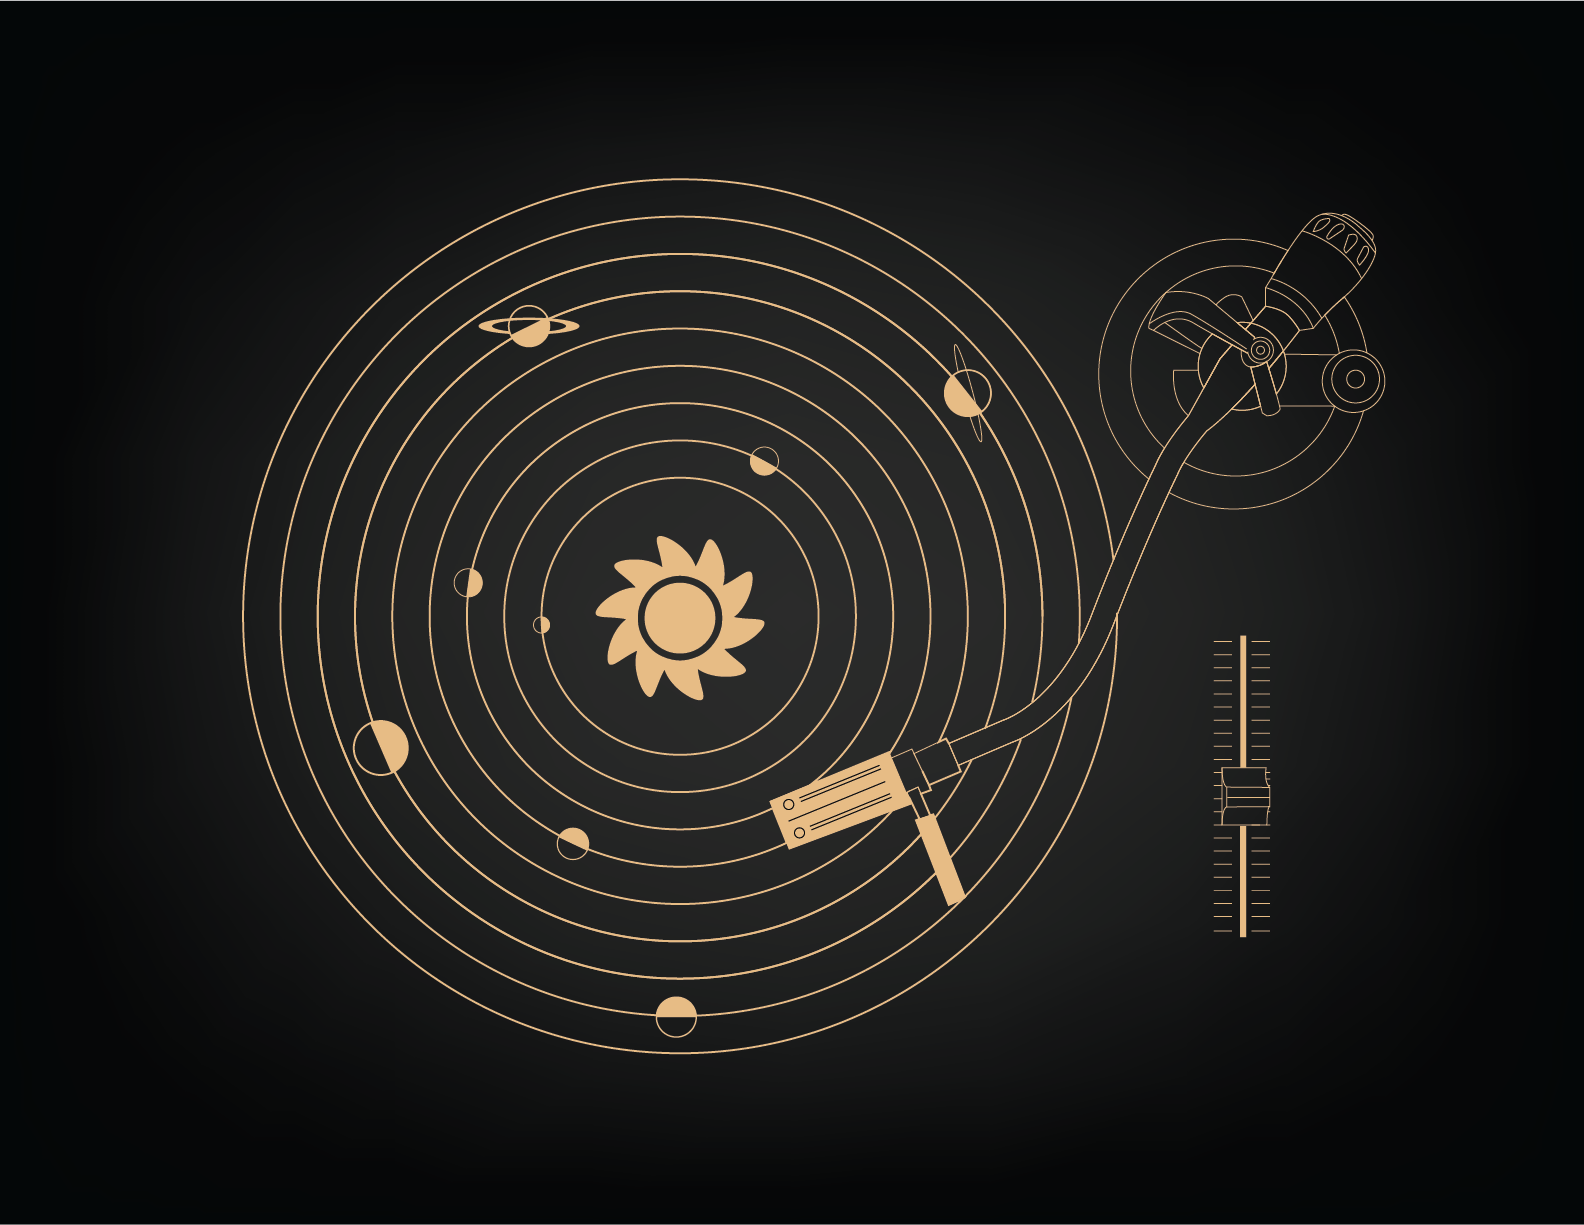 vinyl-solar-system-record-player-planets-kyle-dolan-design-illustration-shirt.png